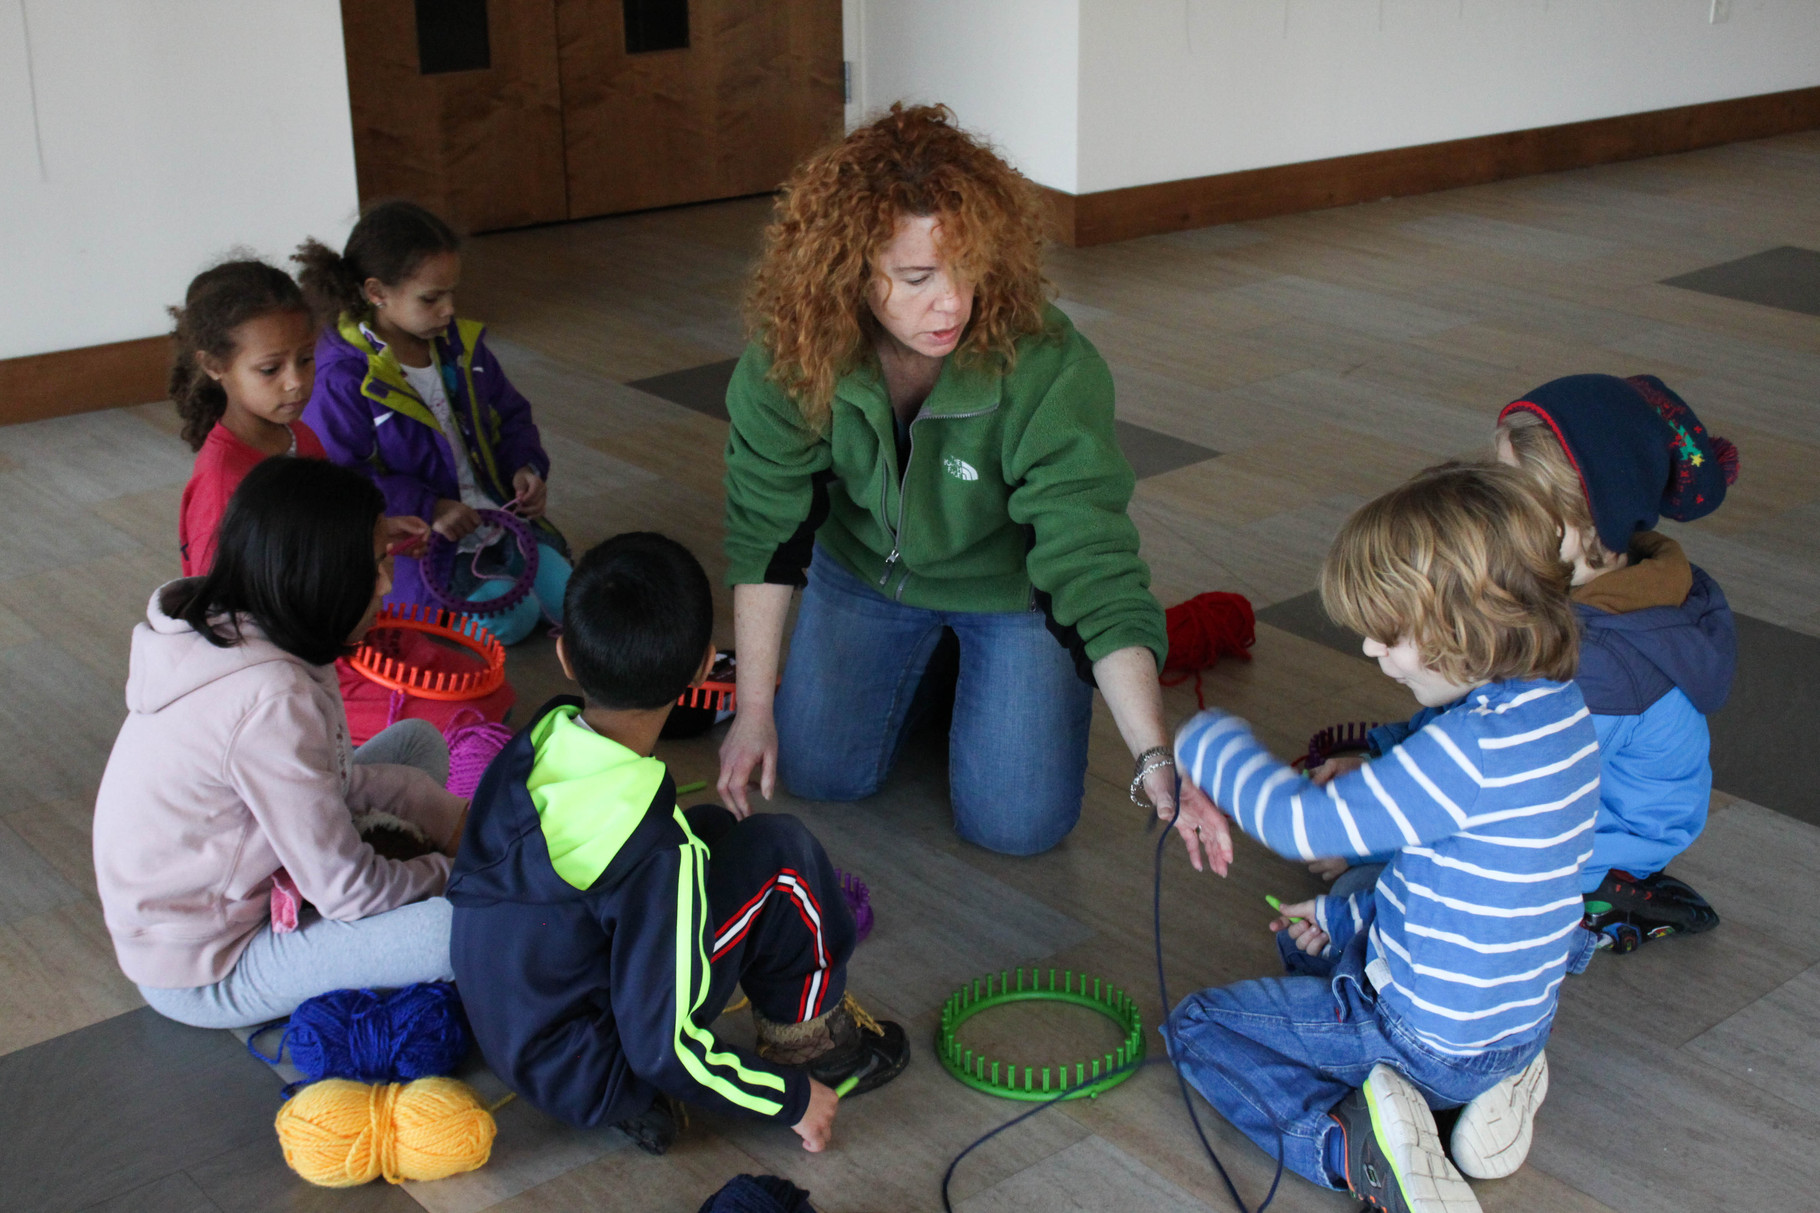 Donna Teschner shows children how to knit hats